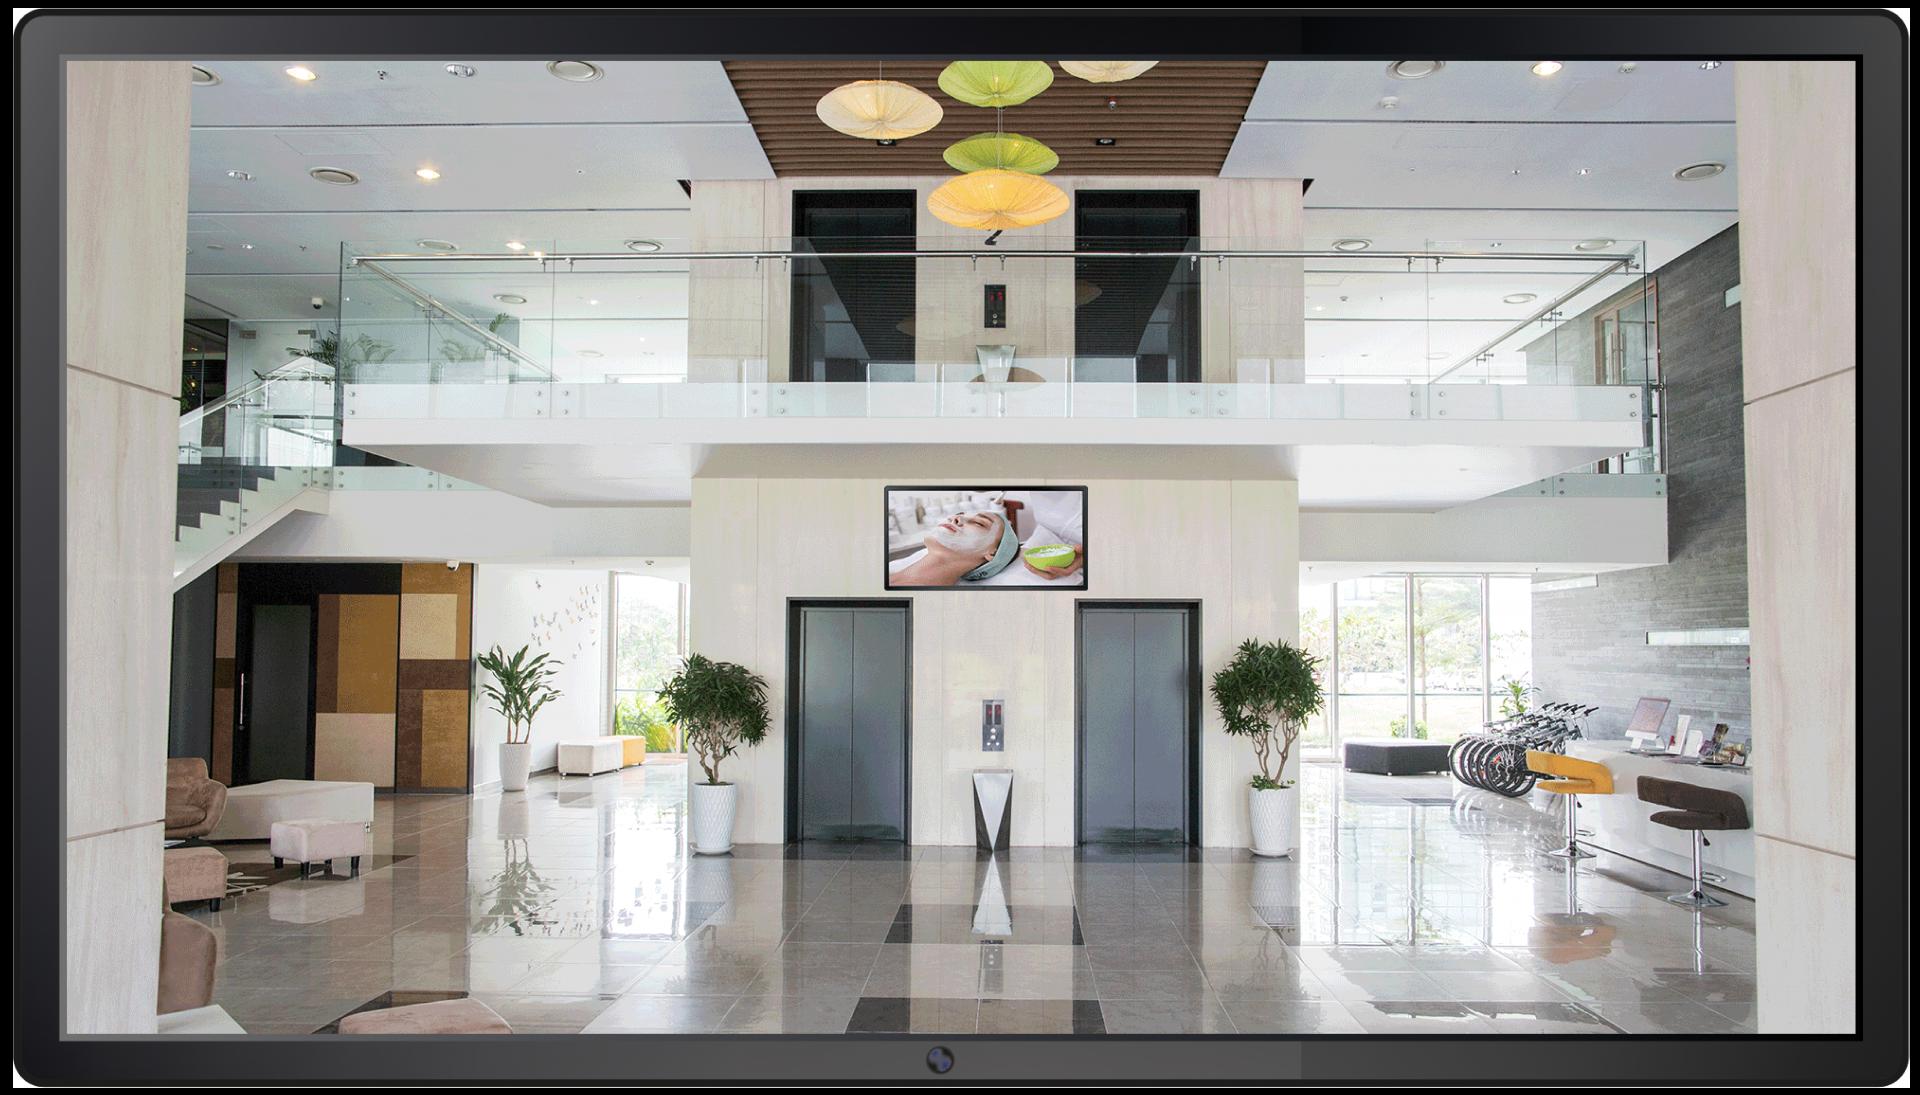 ecran publicitaire hall accueil hotel